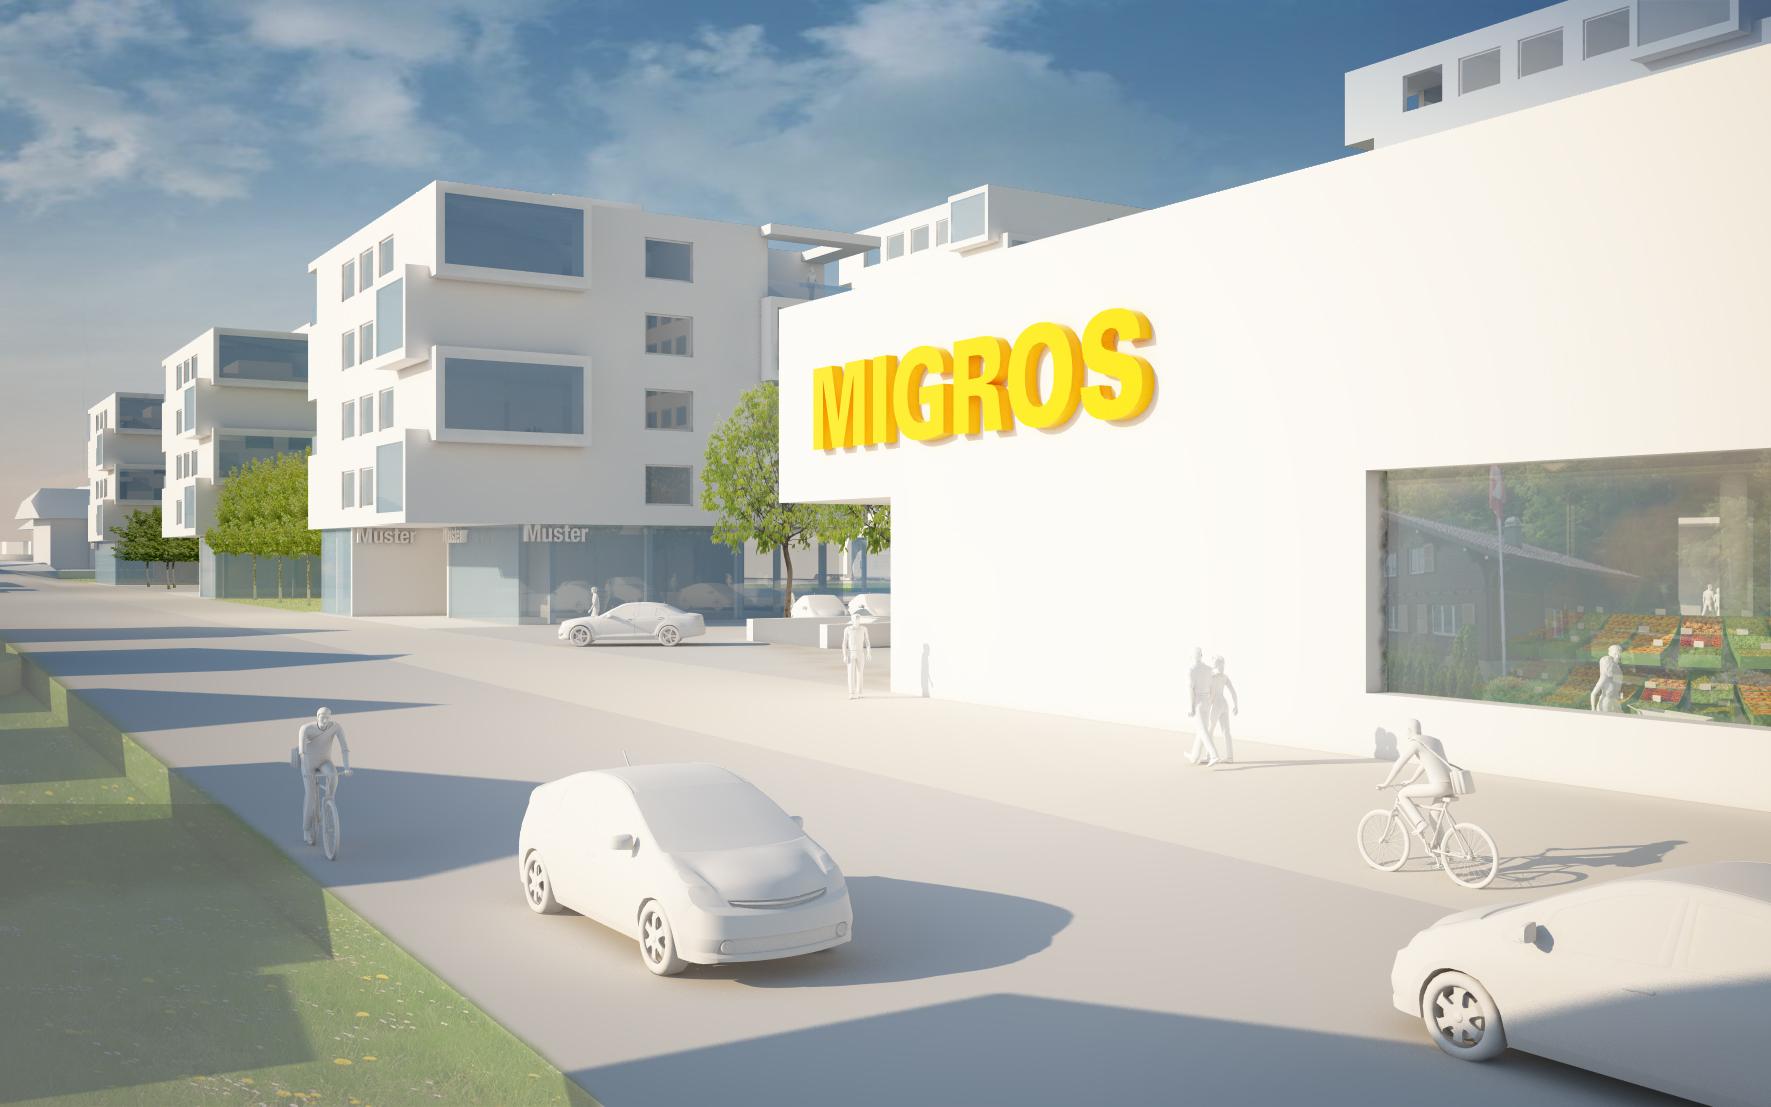 Migros Heimberg